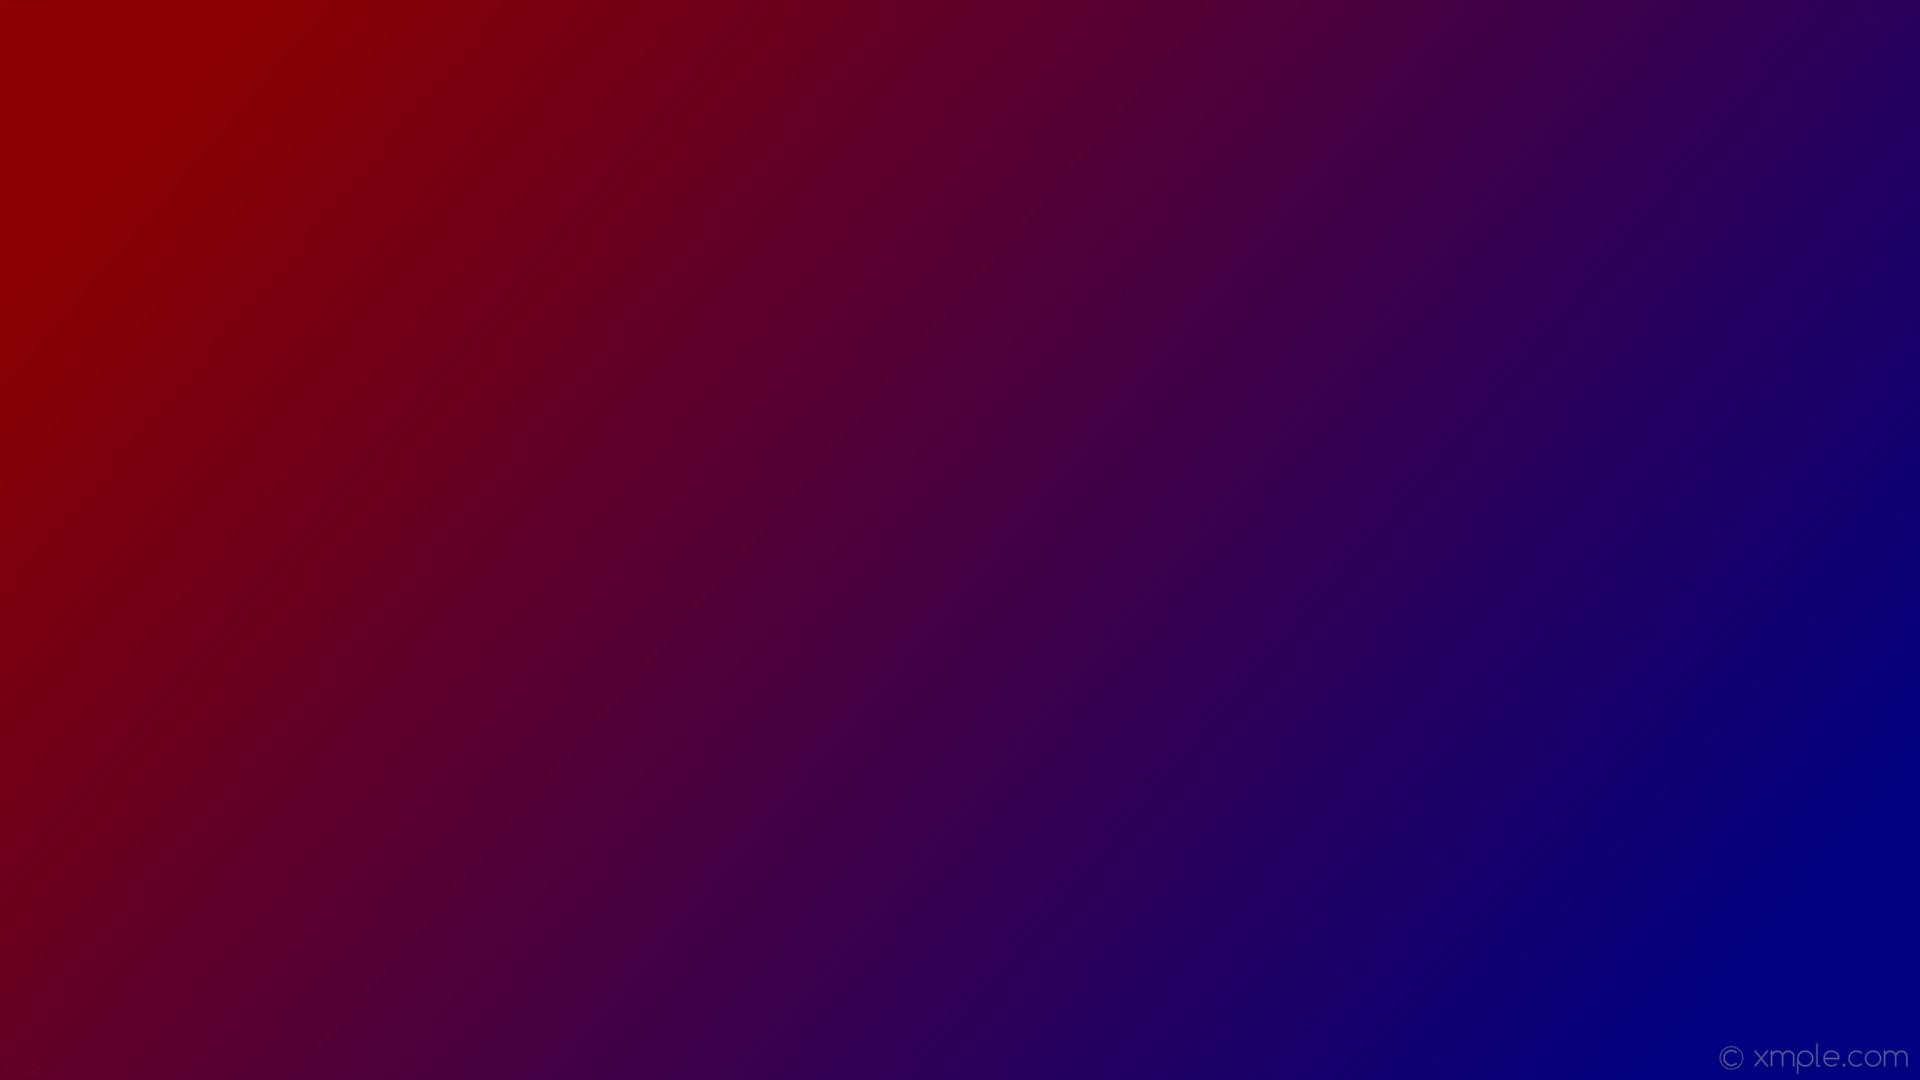 wallpaper gradient linear red blue dark red navy #8b0000 #000080 165°